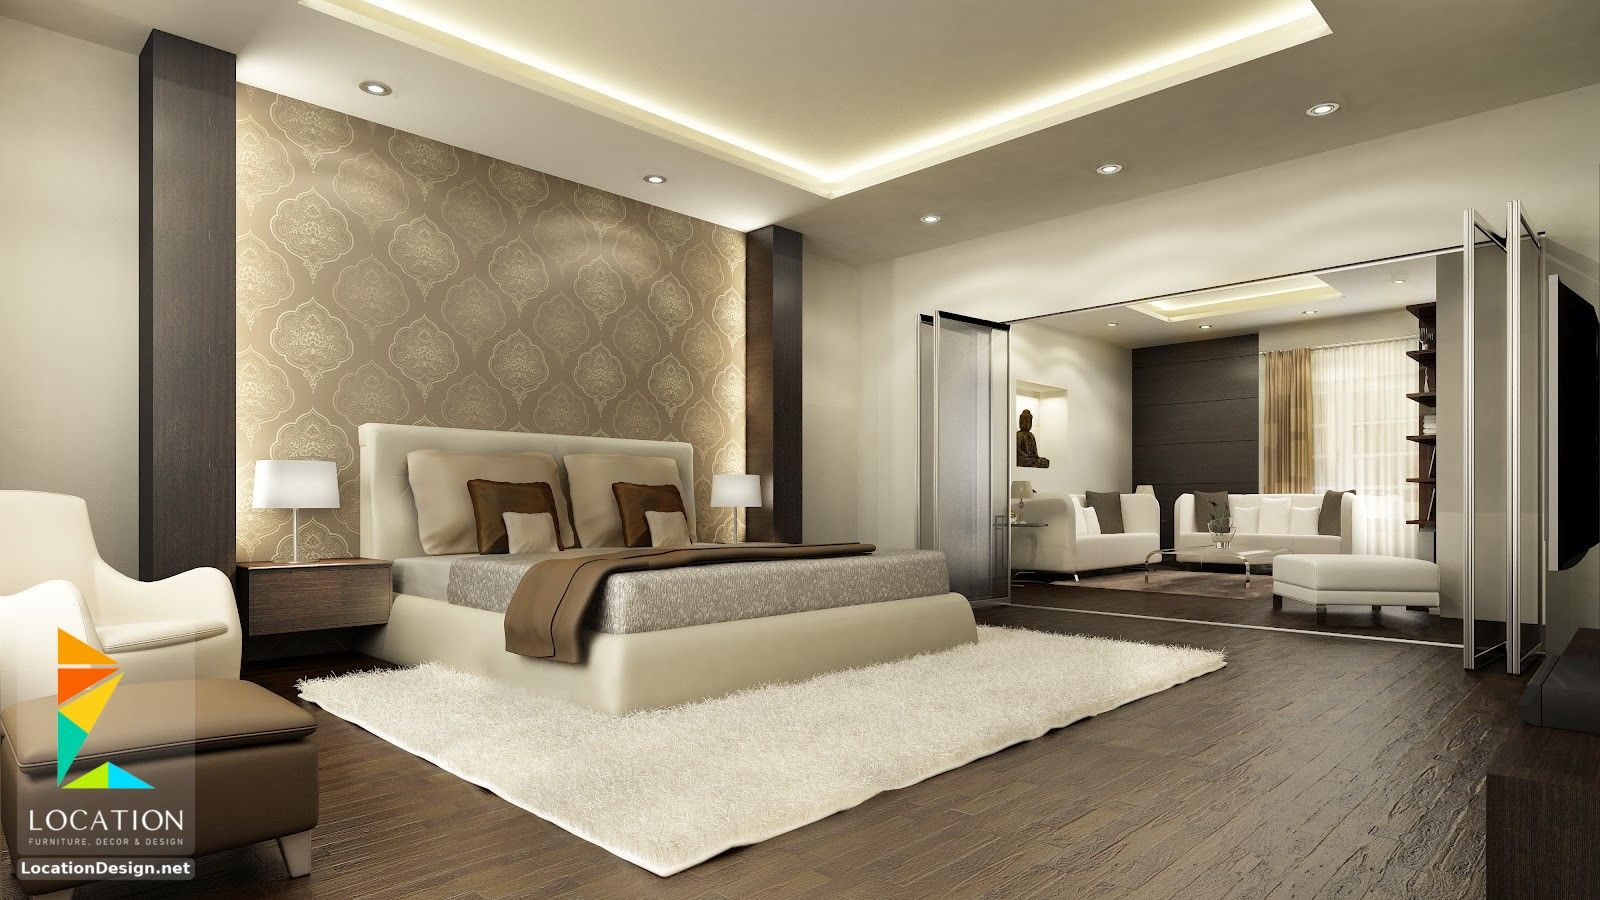 غرف نوم للعرسان كامله اسعار 2019 2020 Modern Master Bedroom